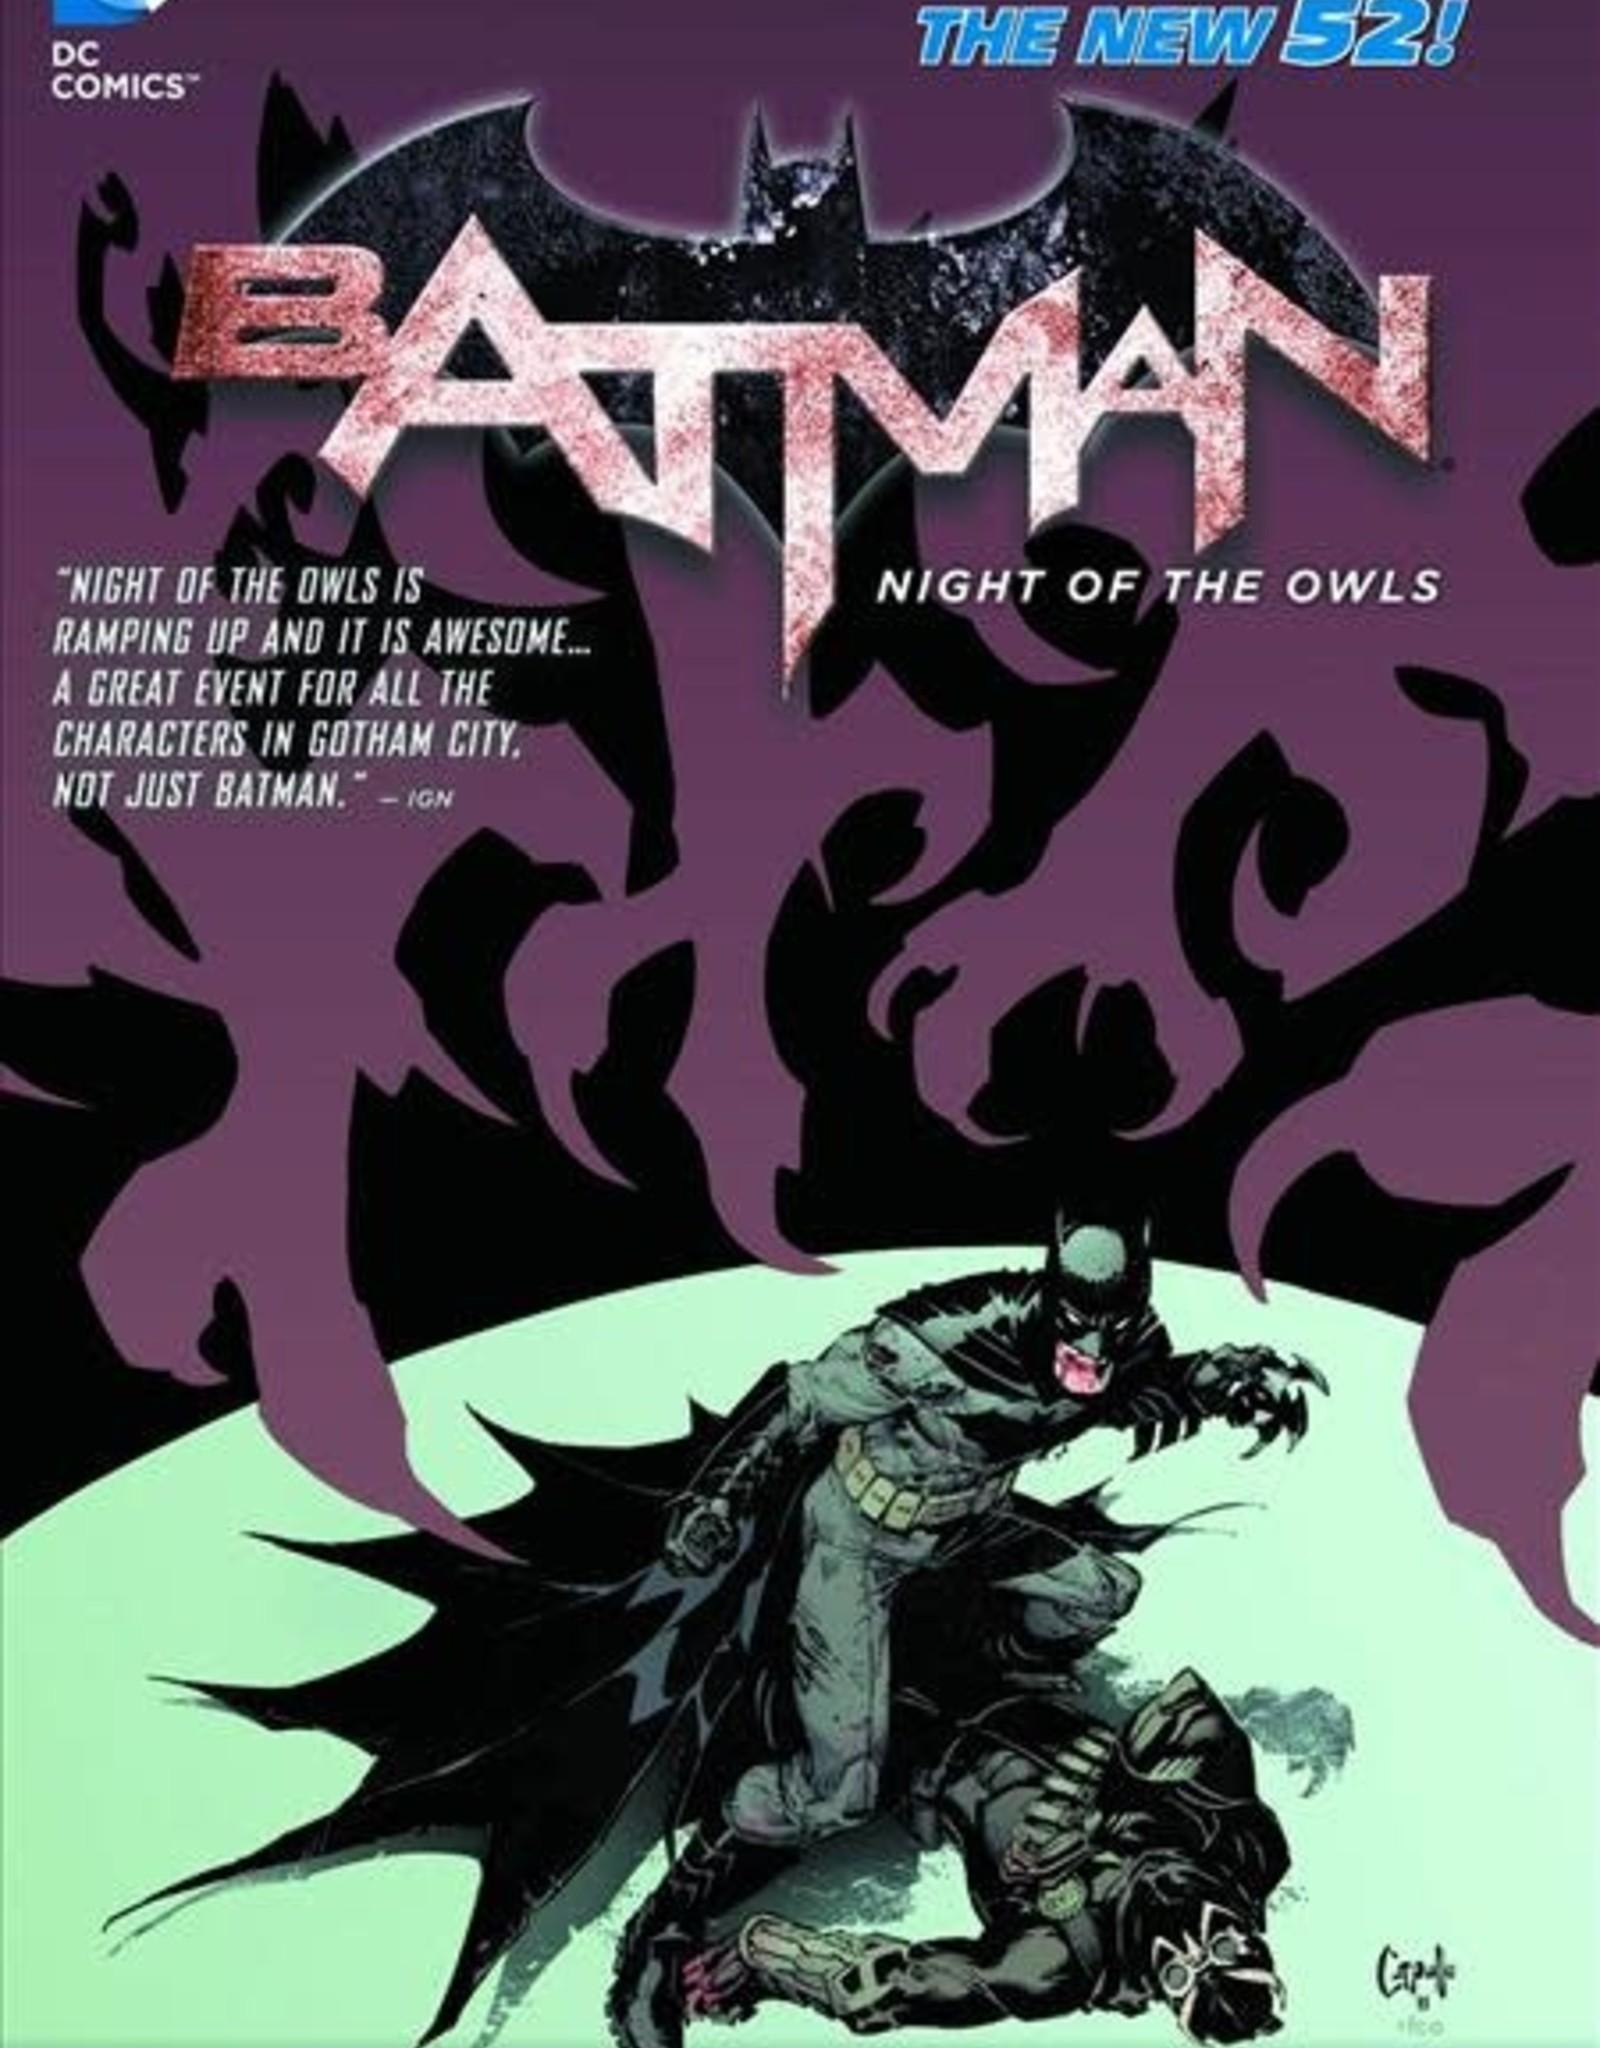 DC Comics Batman Night of the Owls TP (N52)